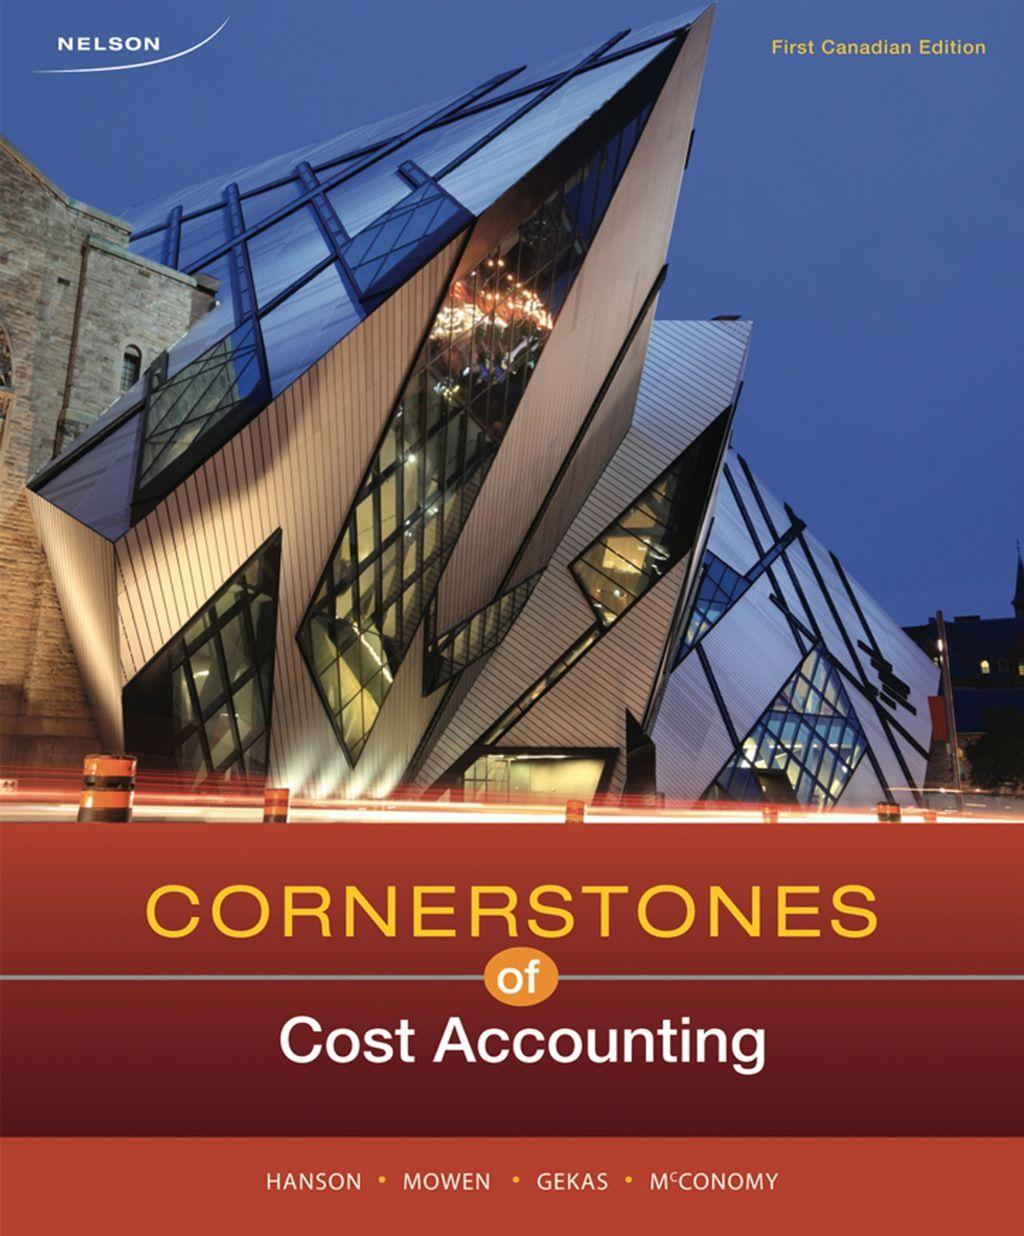 Cornerstones of Cost Accounting (eBook Rental) Cost